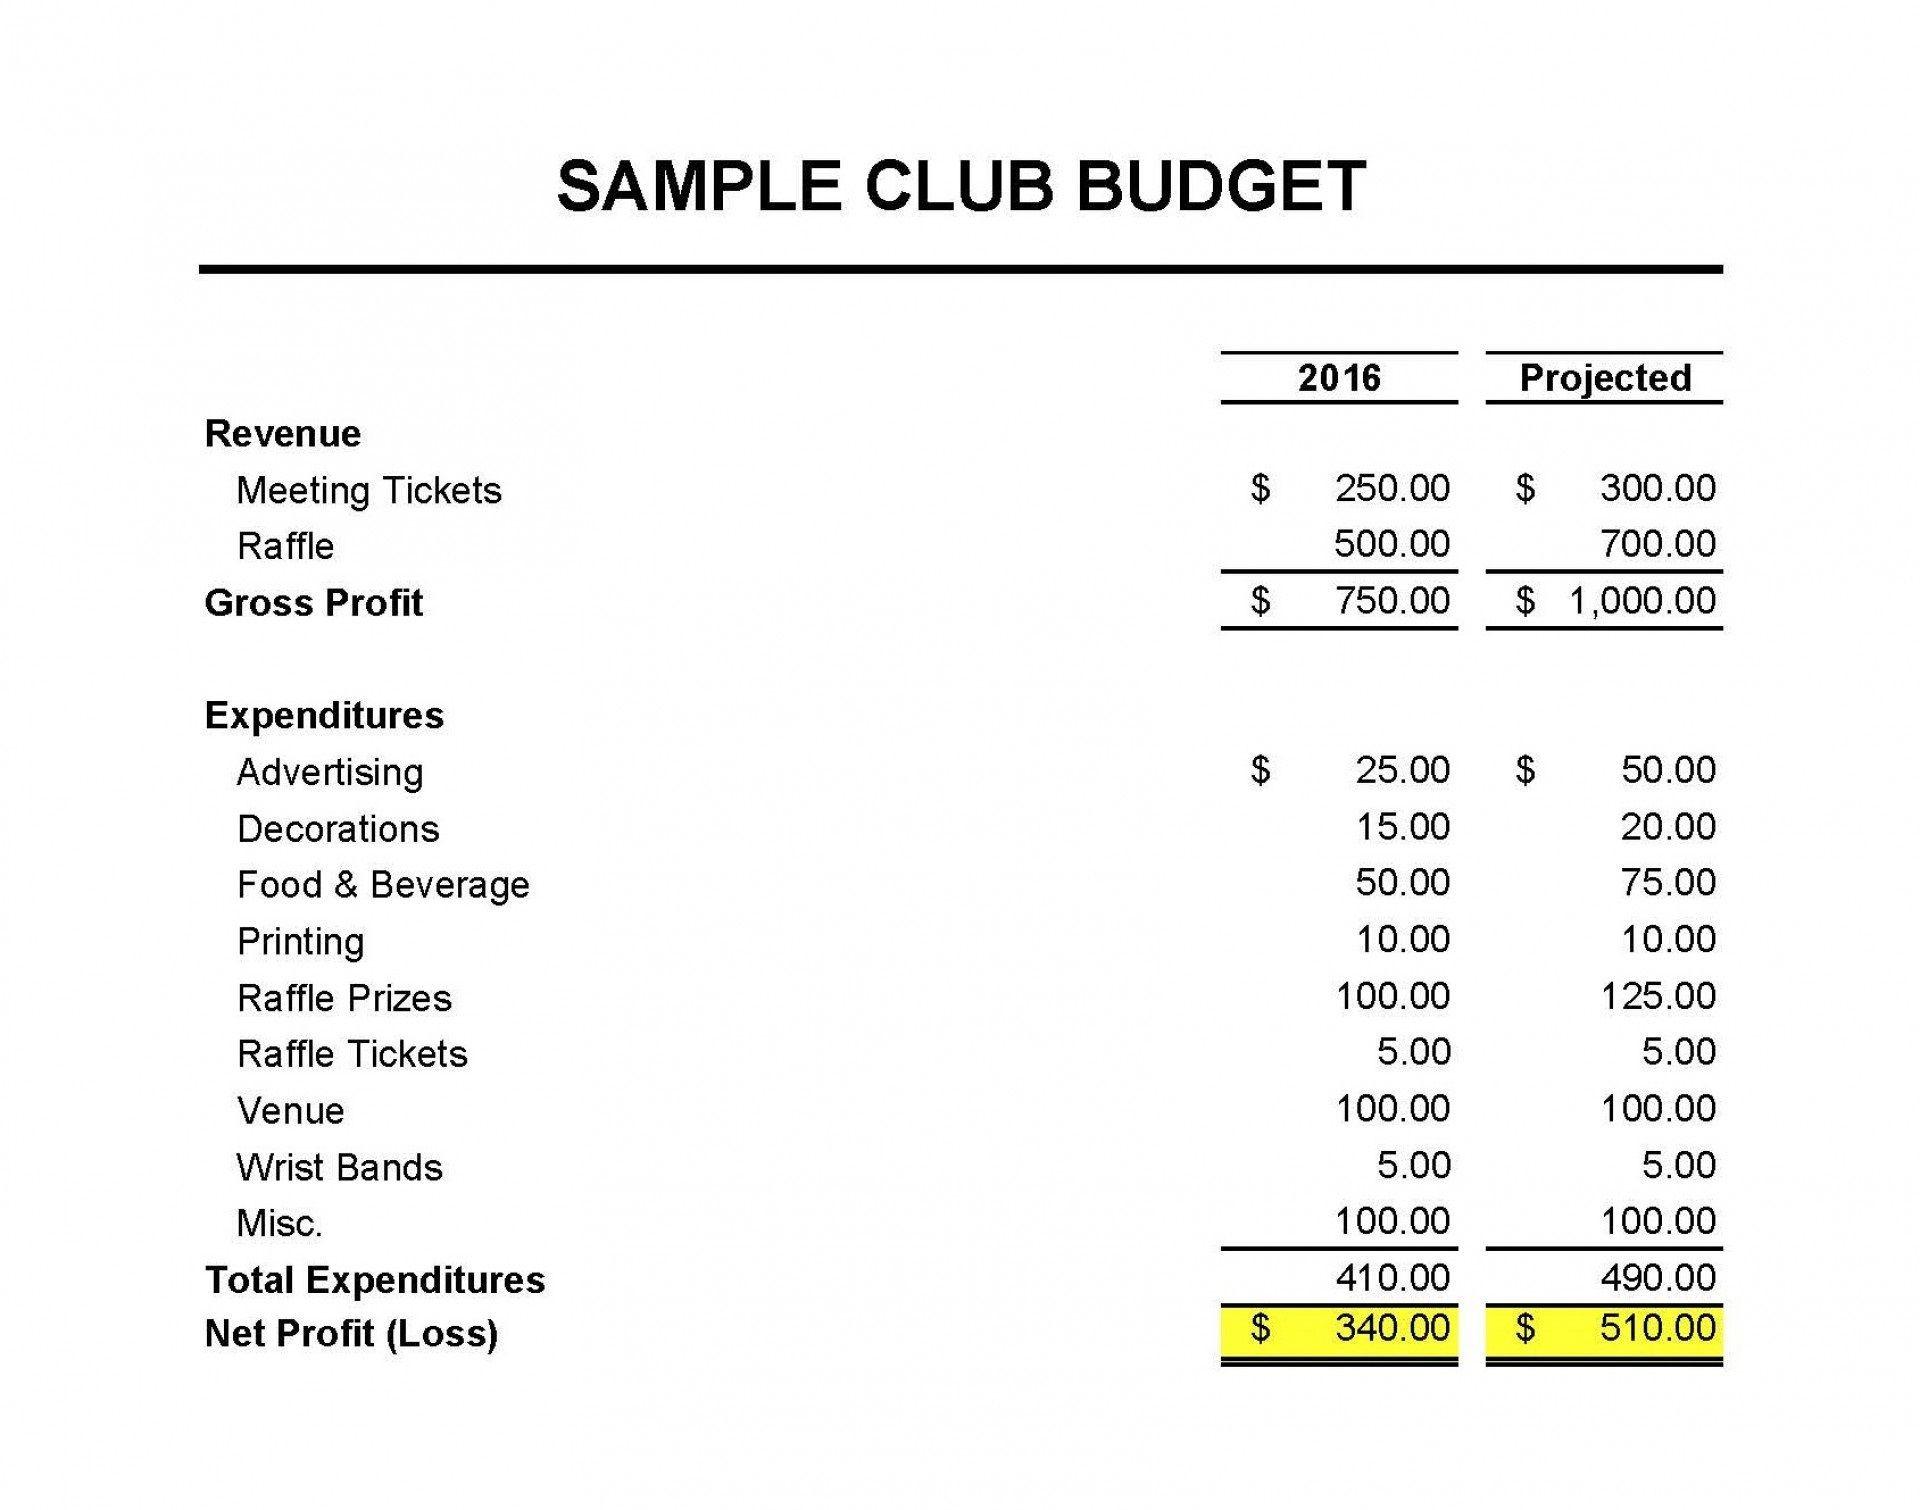 005 Fantastic Treasurer Report Template Non Profit Highest Quality  Treasurer' Word Free For Nonprofit Organization1920